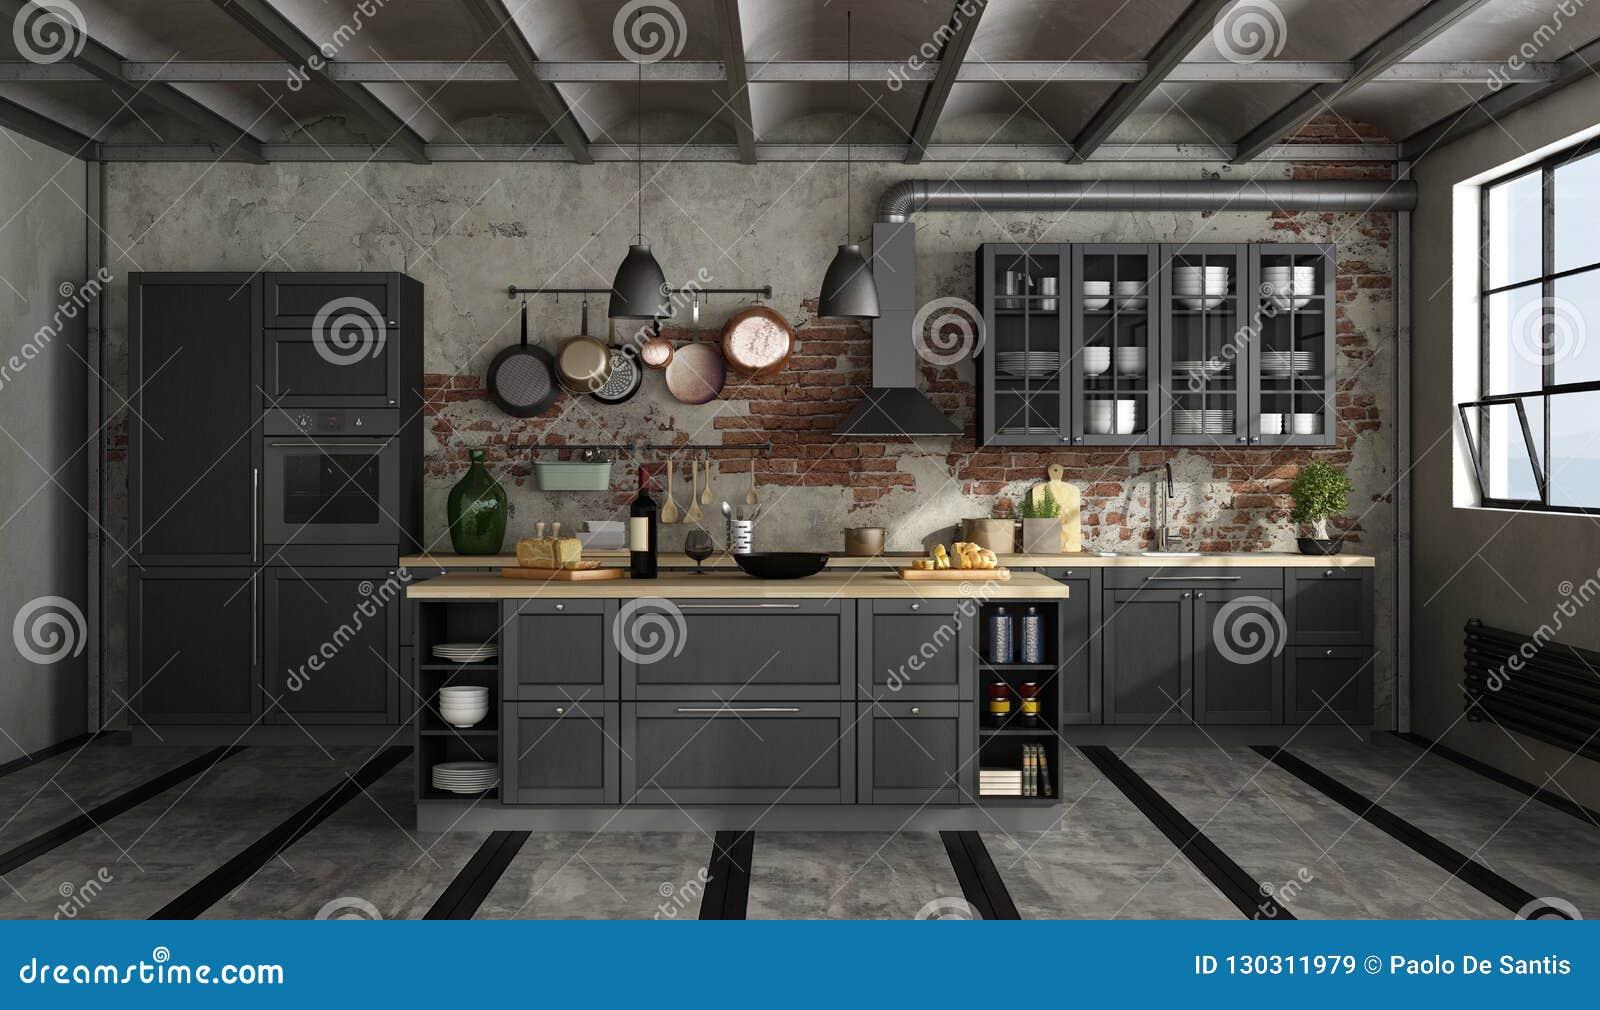 Retro Design Keuken : Retro zwarte keuken in een oude ruimte stock illustratie